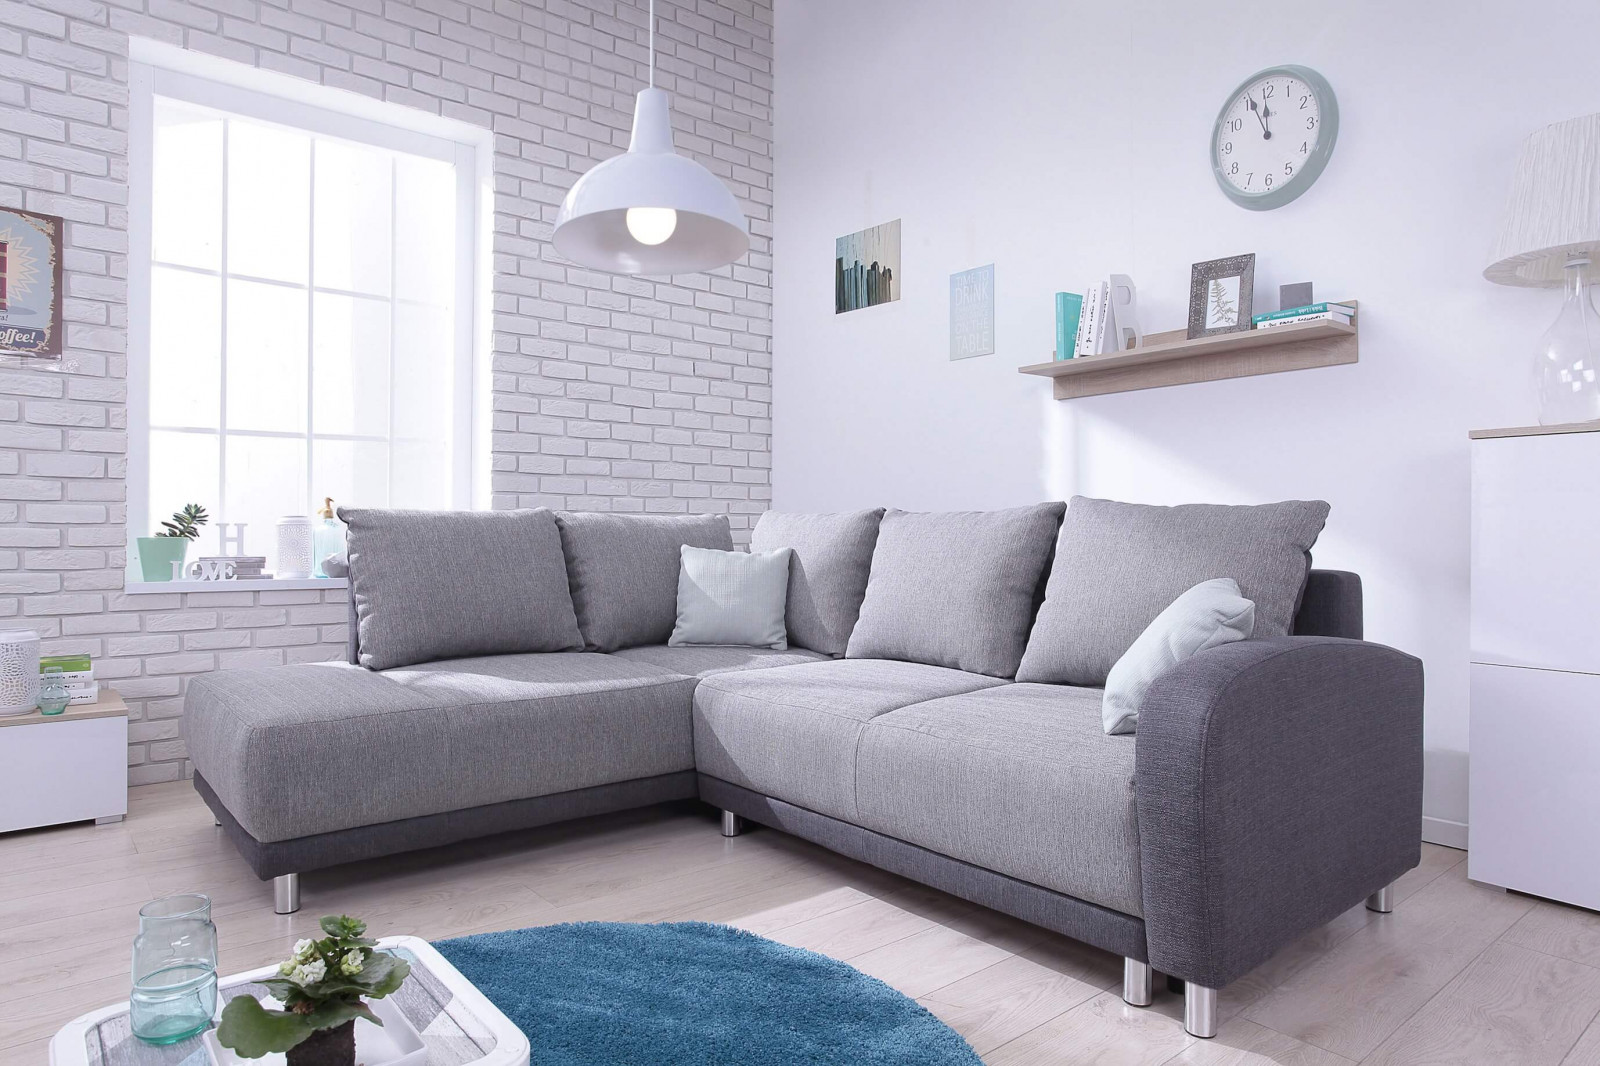 Sofa large corner convertible THE MINTY | BOBOCHIC ®